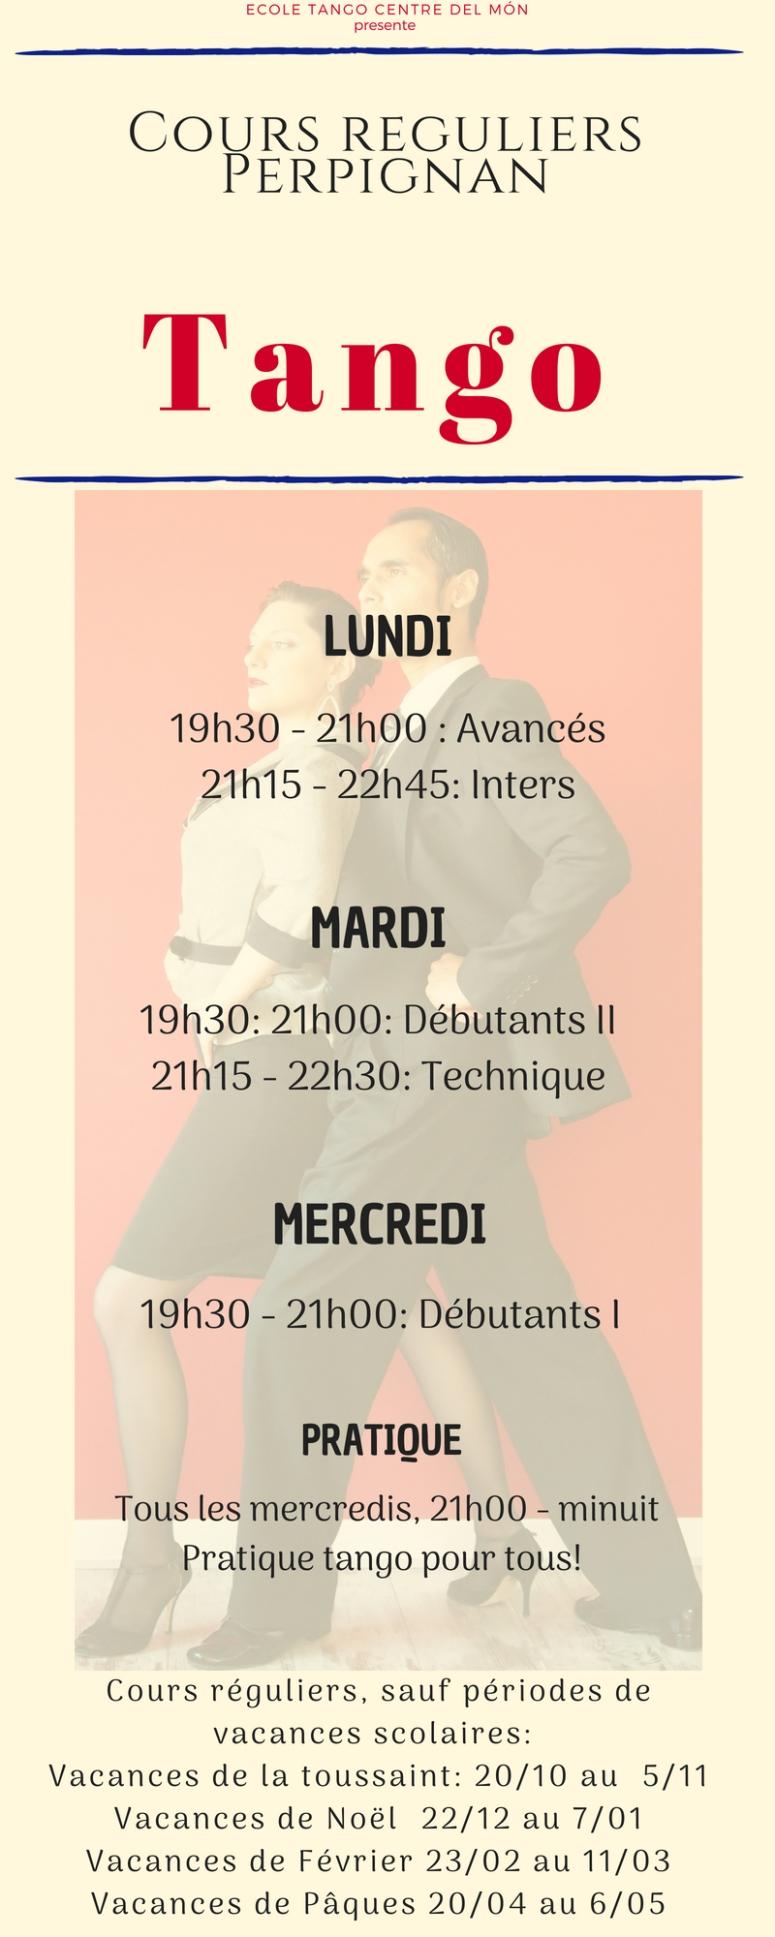 Ecole tango planning